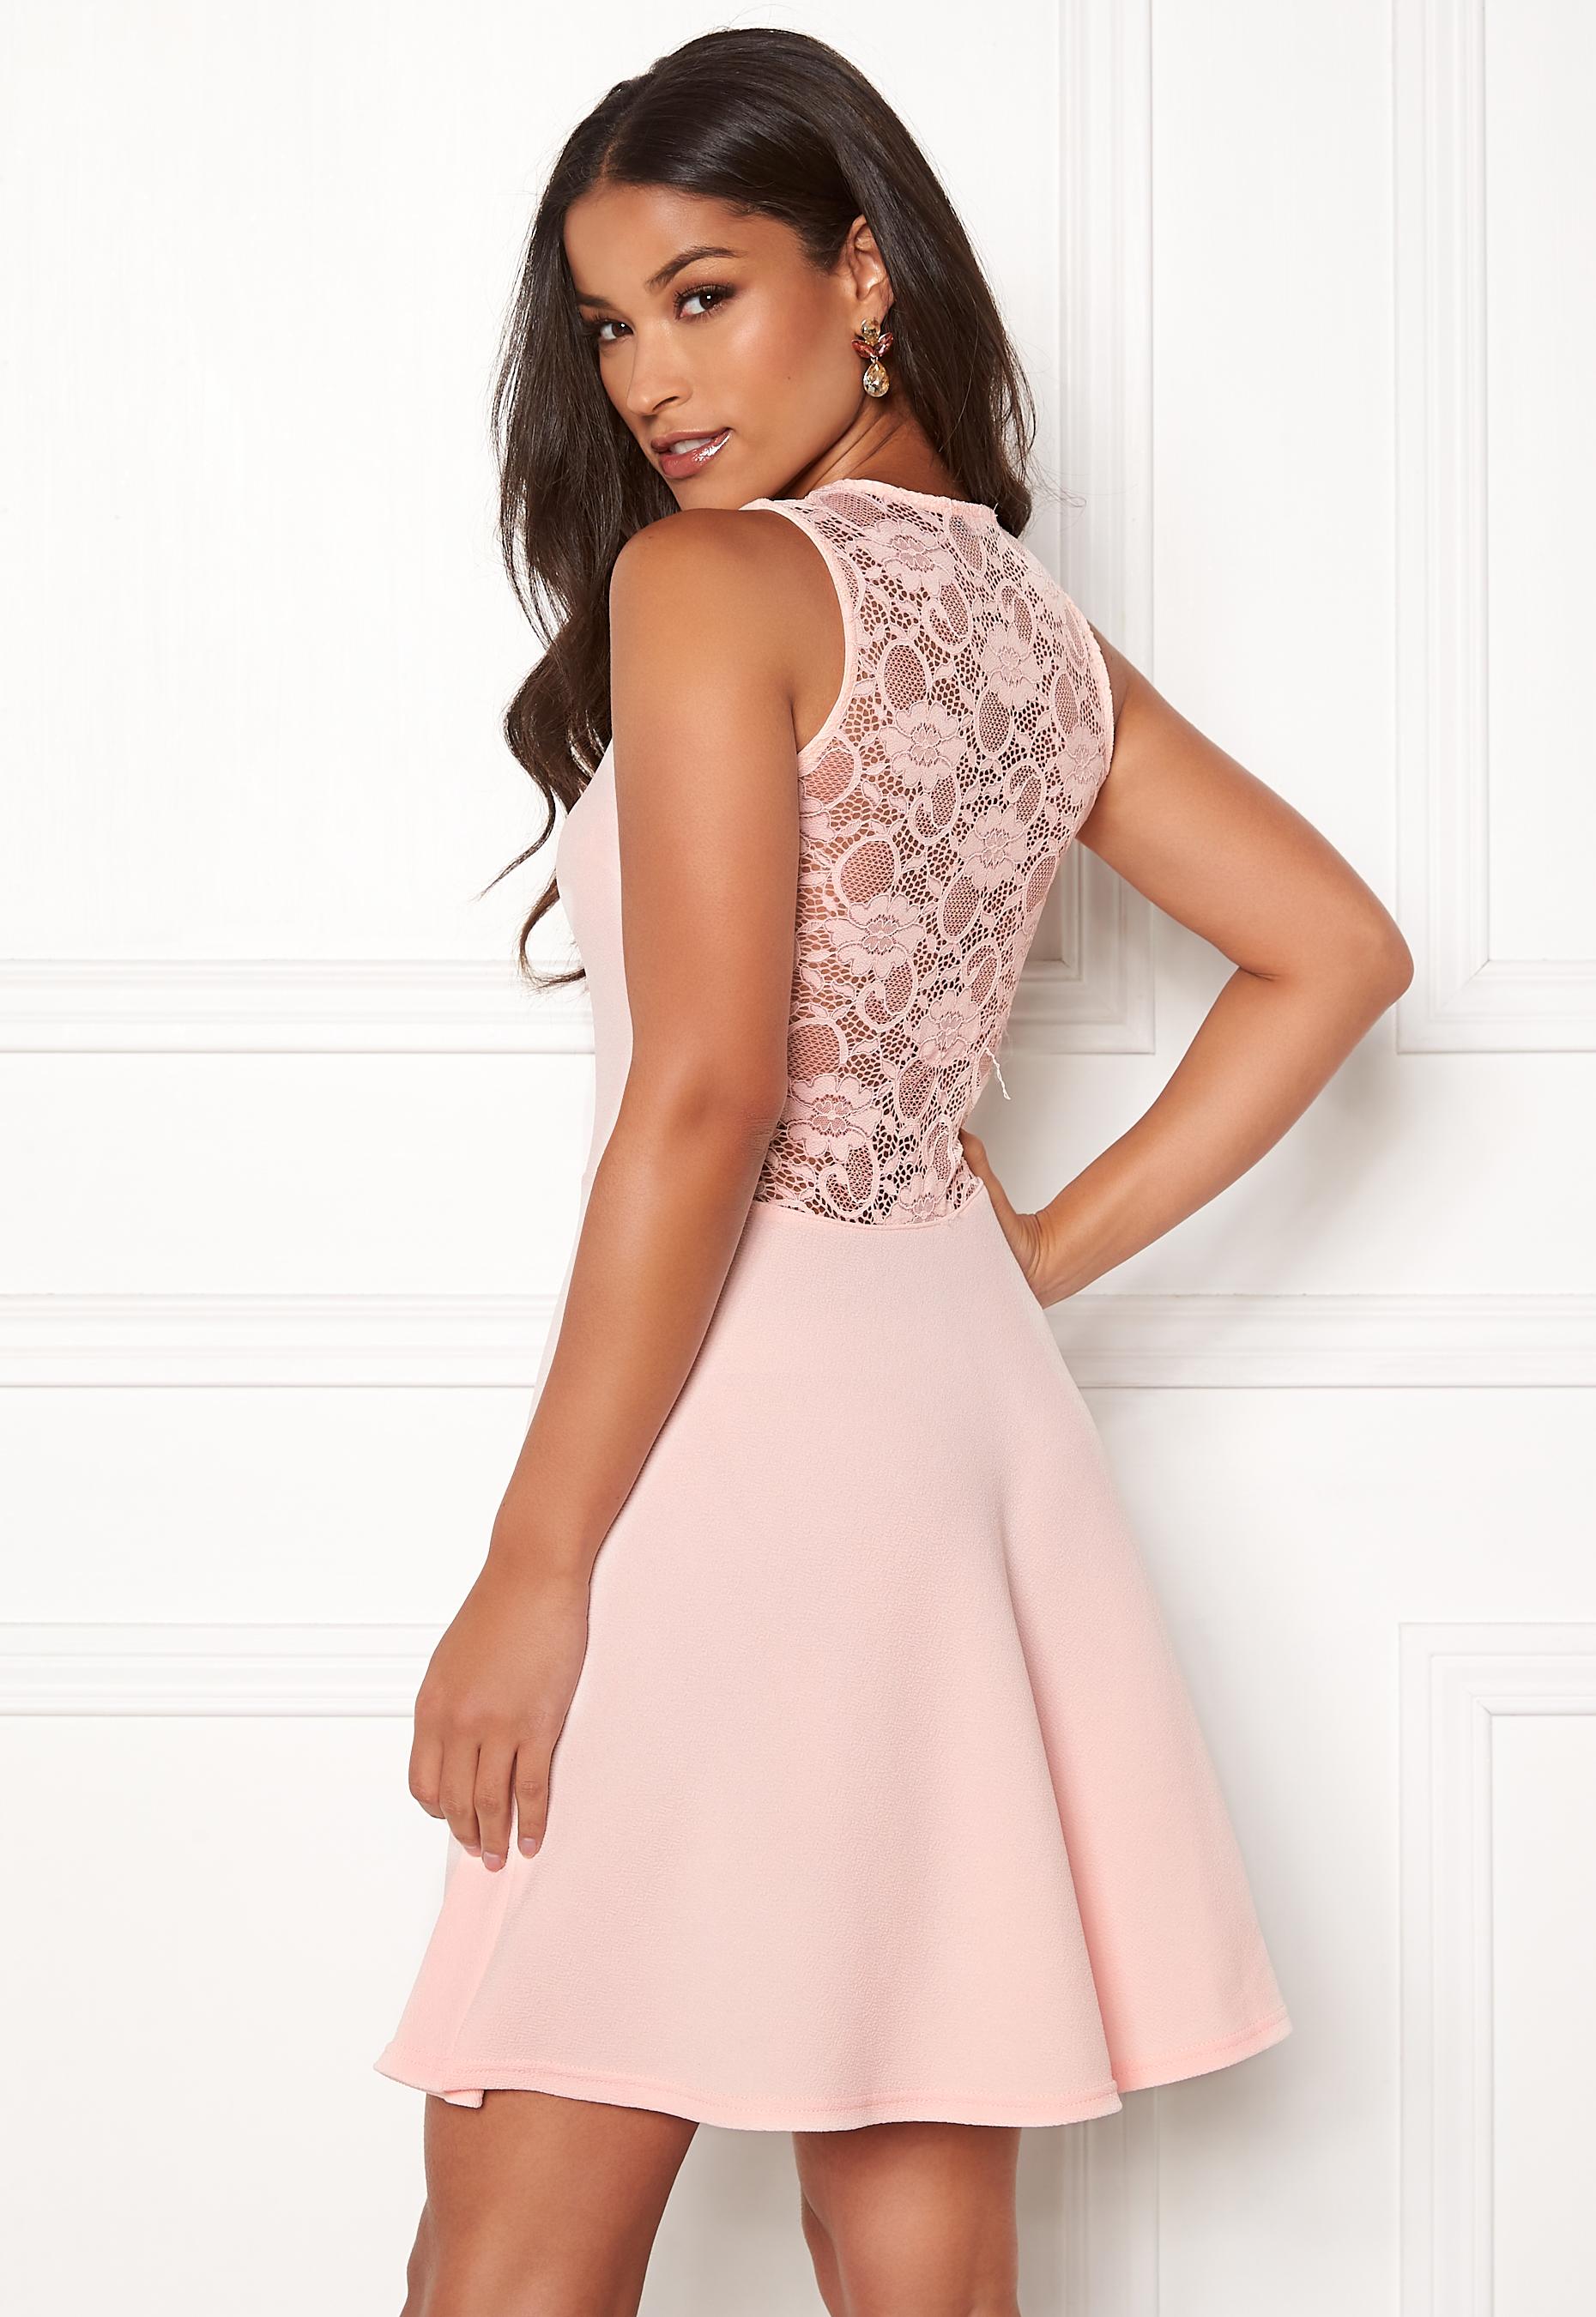 Sisters Point Nando Lace Dress 585 Rose - Bubbleroom 4e10944015ecb